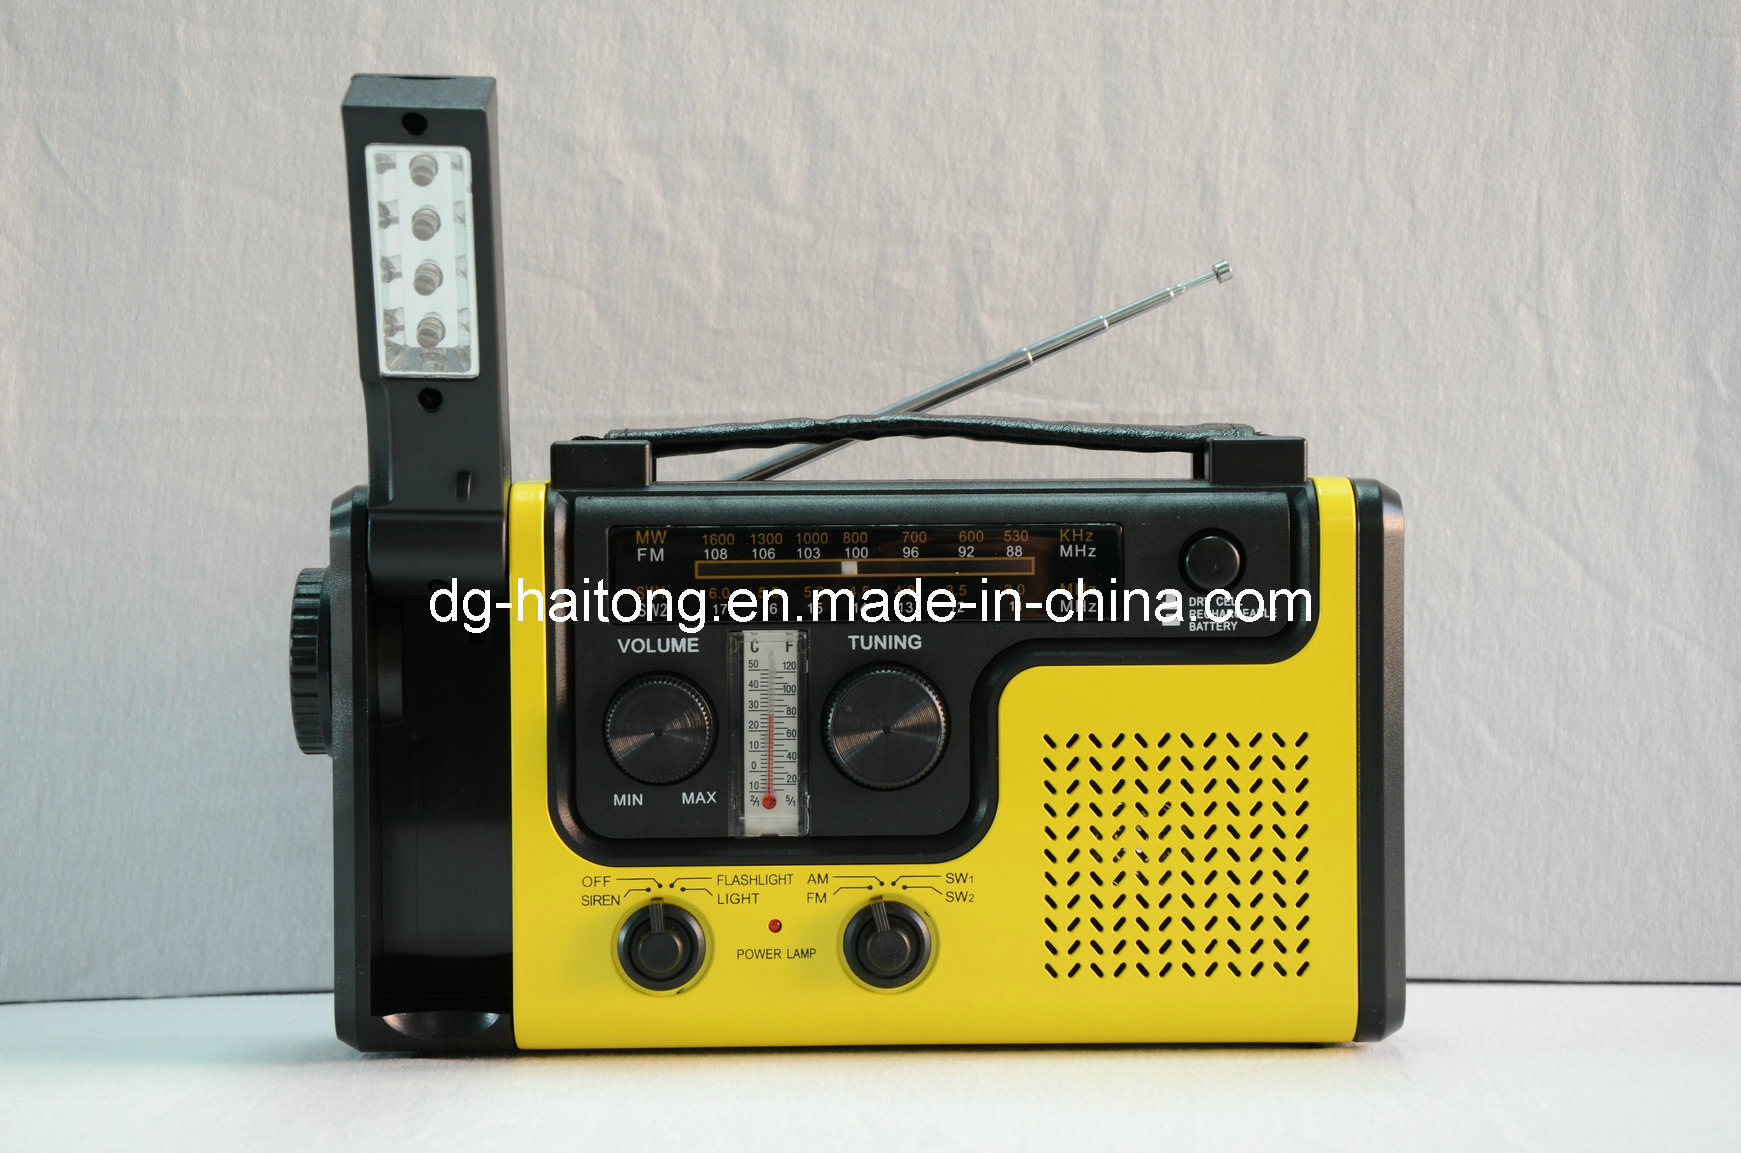 Solar Hand Crank Radio with Flashlight &Table Lamp Ht-998wb